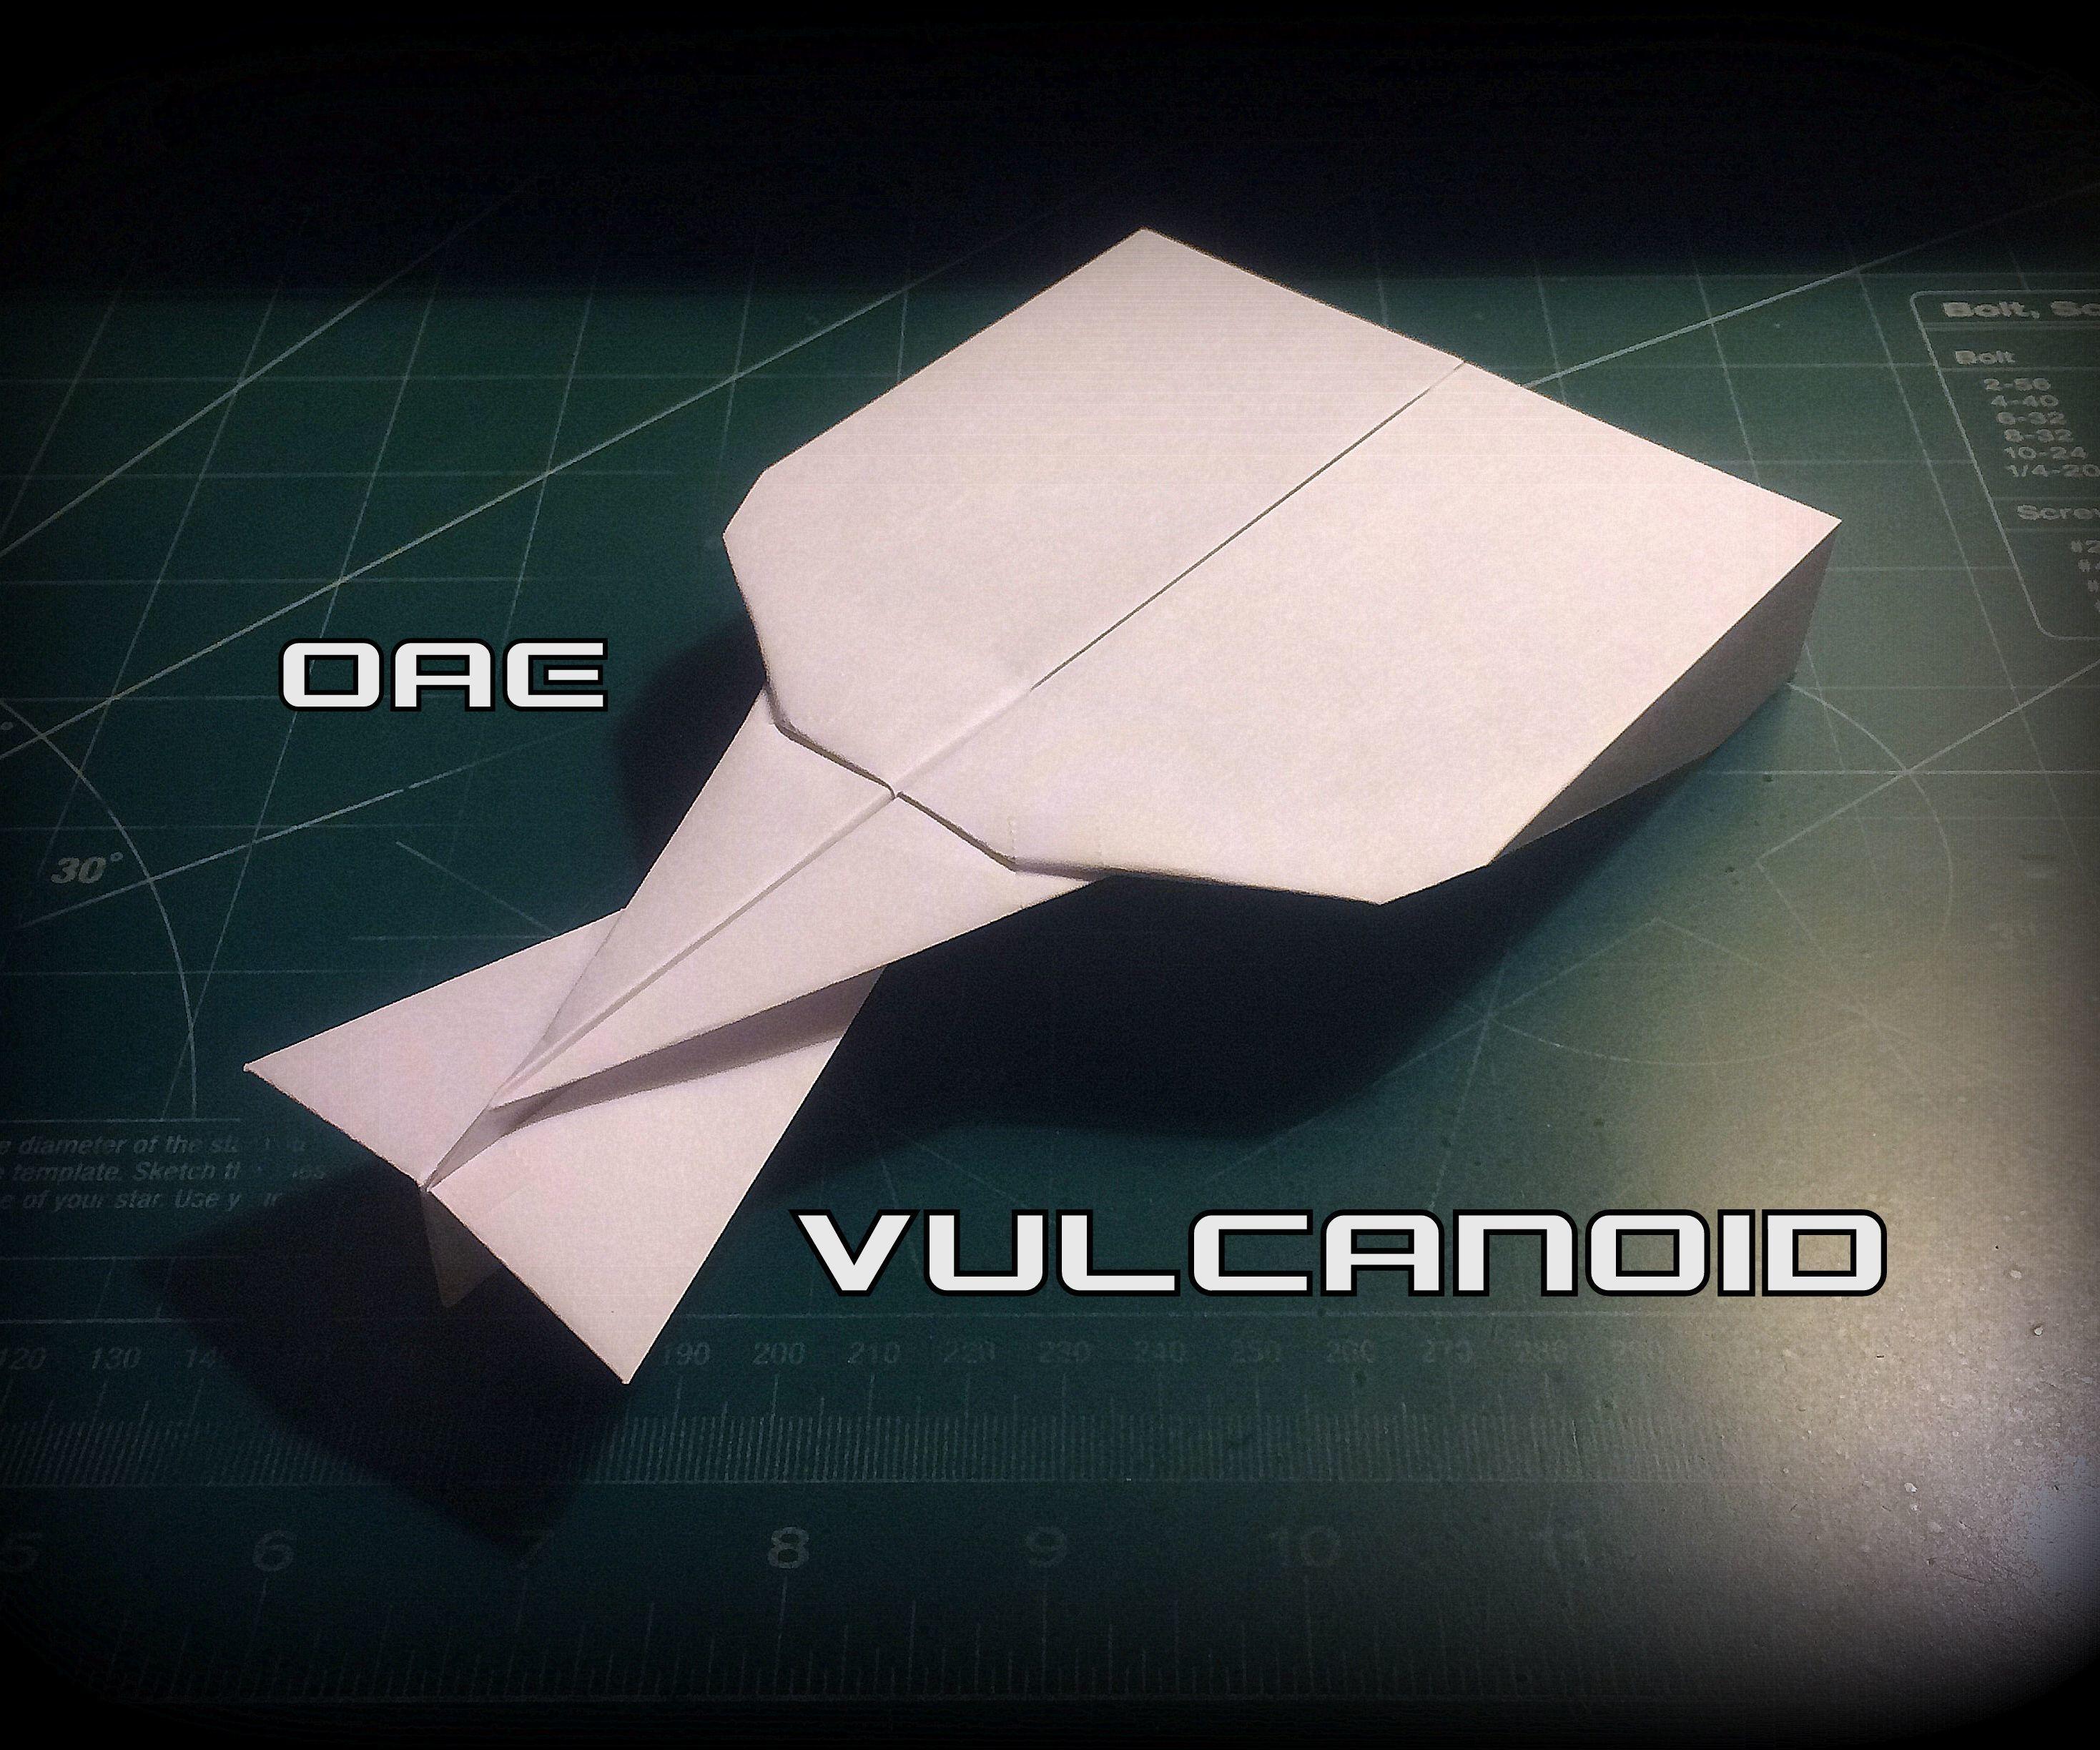 How To Make The Vulcanoid Paper Airplane